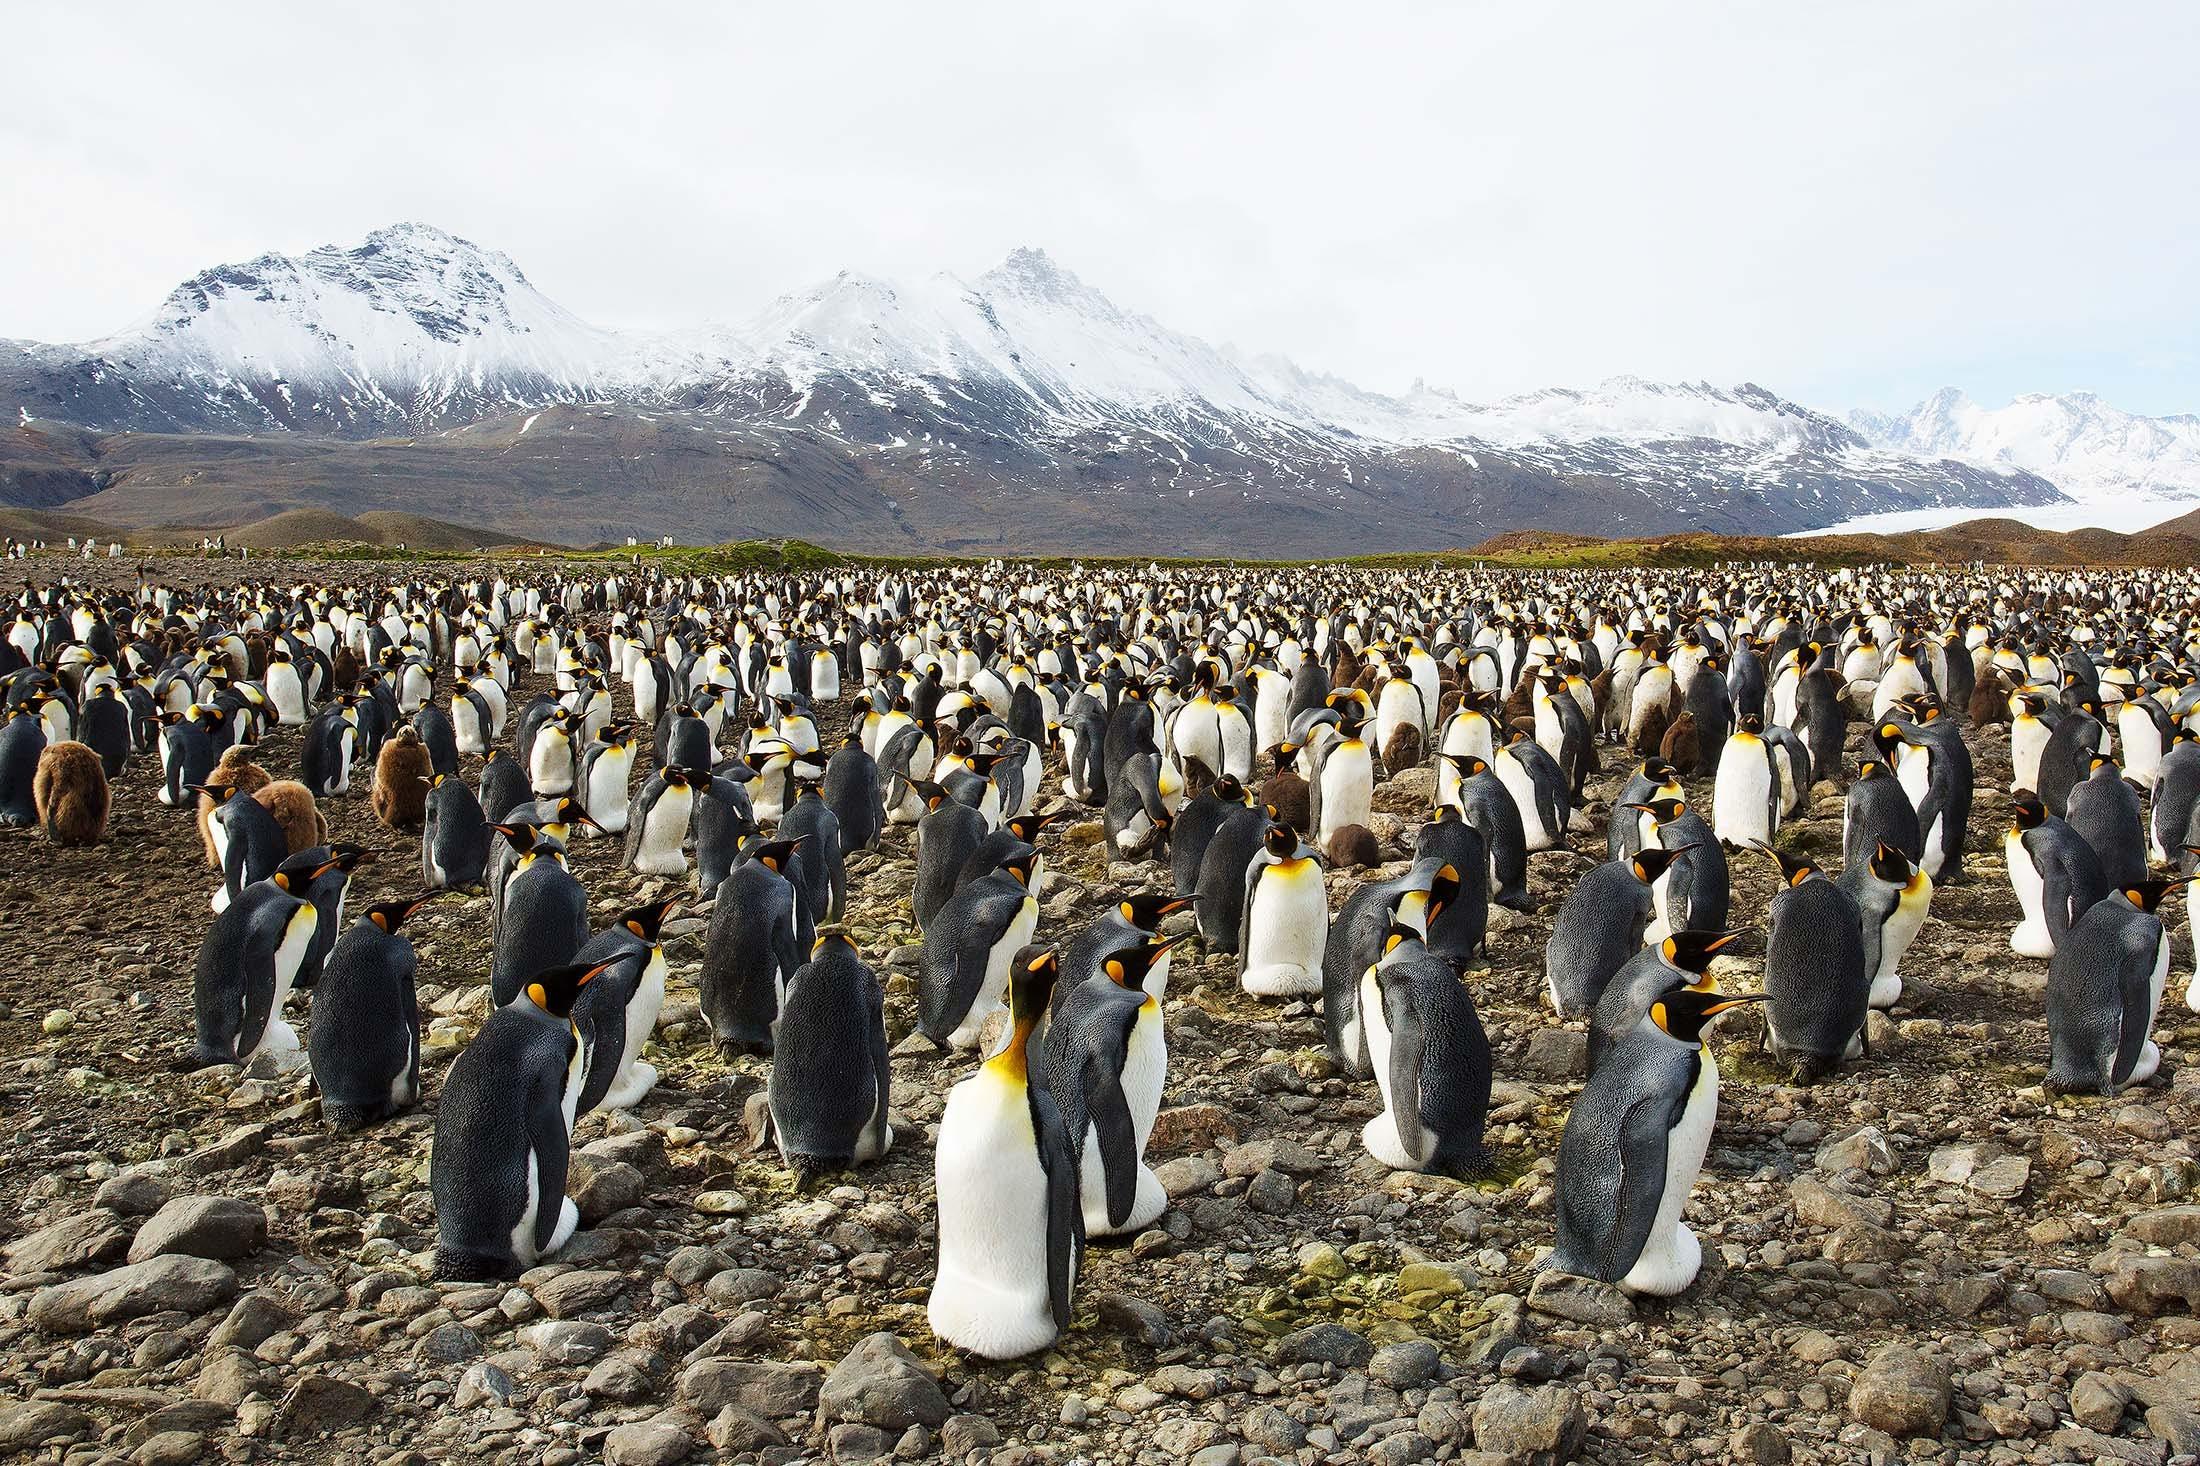 Fortuna Bay, South Georgia, Antarctica